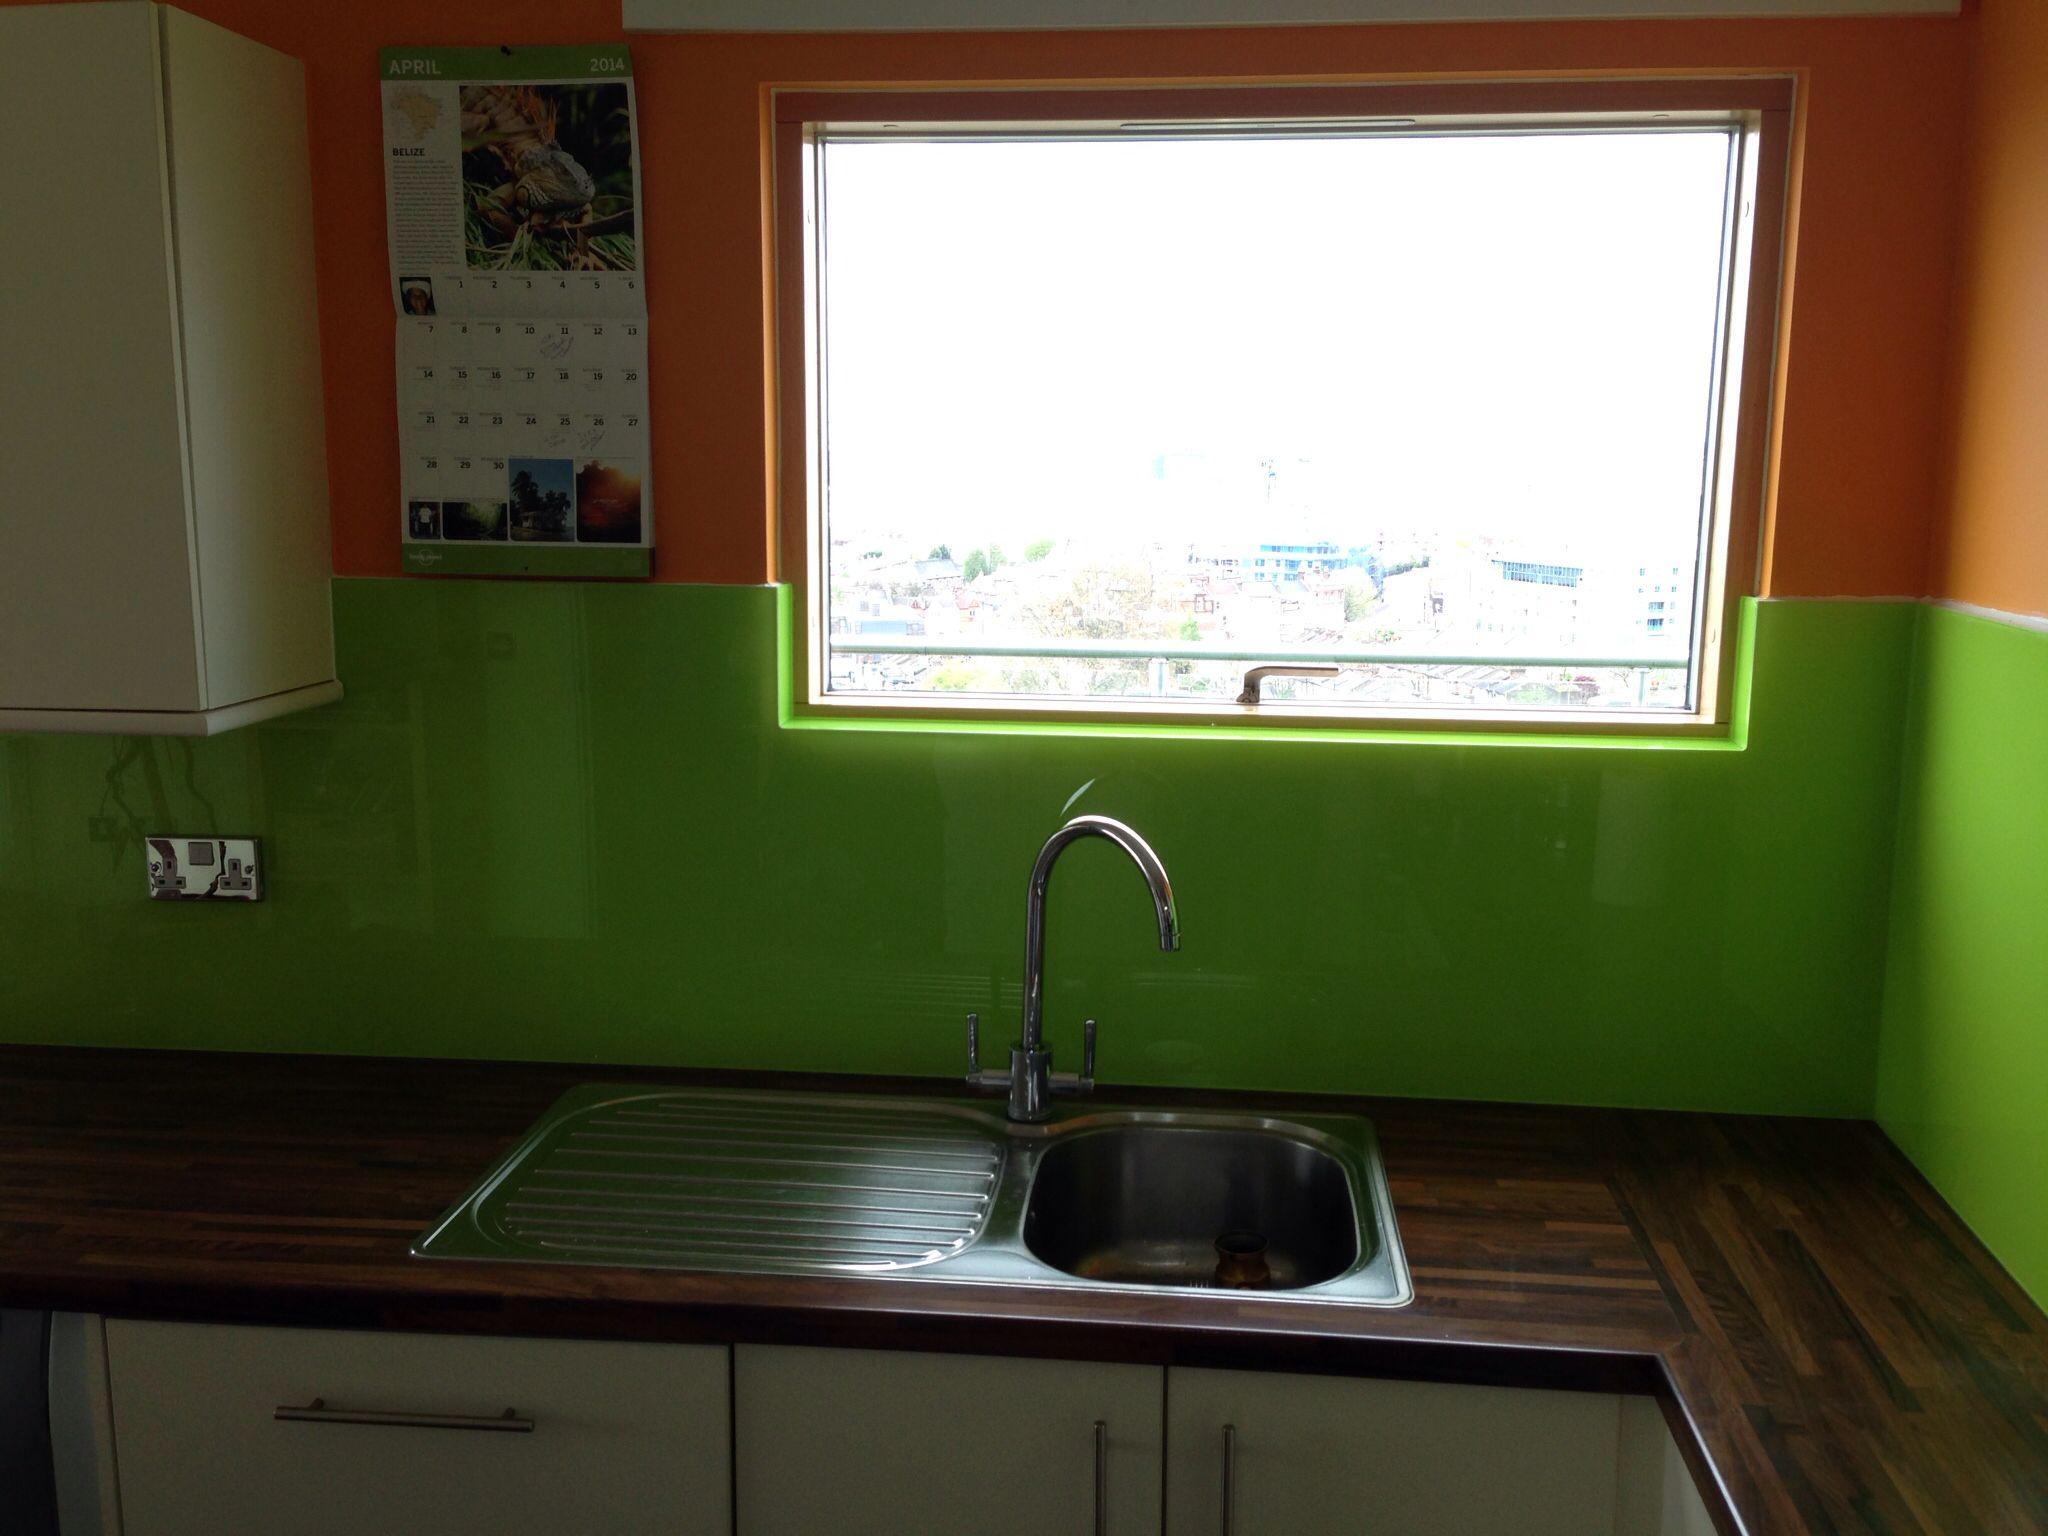 Glass splashbacks for bathroom sinks - Orange Lime Green Kitchen Glass Splashback By Creoglass Design London Uk View More Glass Kitchen Splashbacks And Non Scratch Worktops On Www C